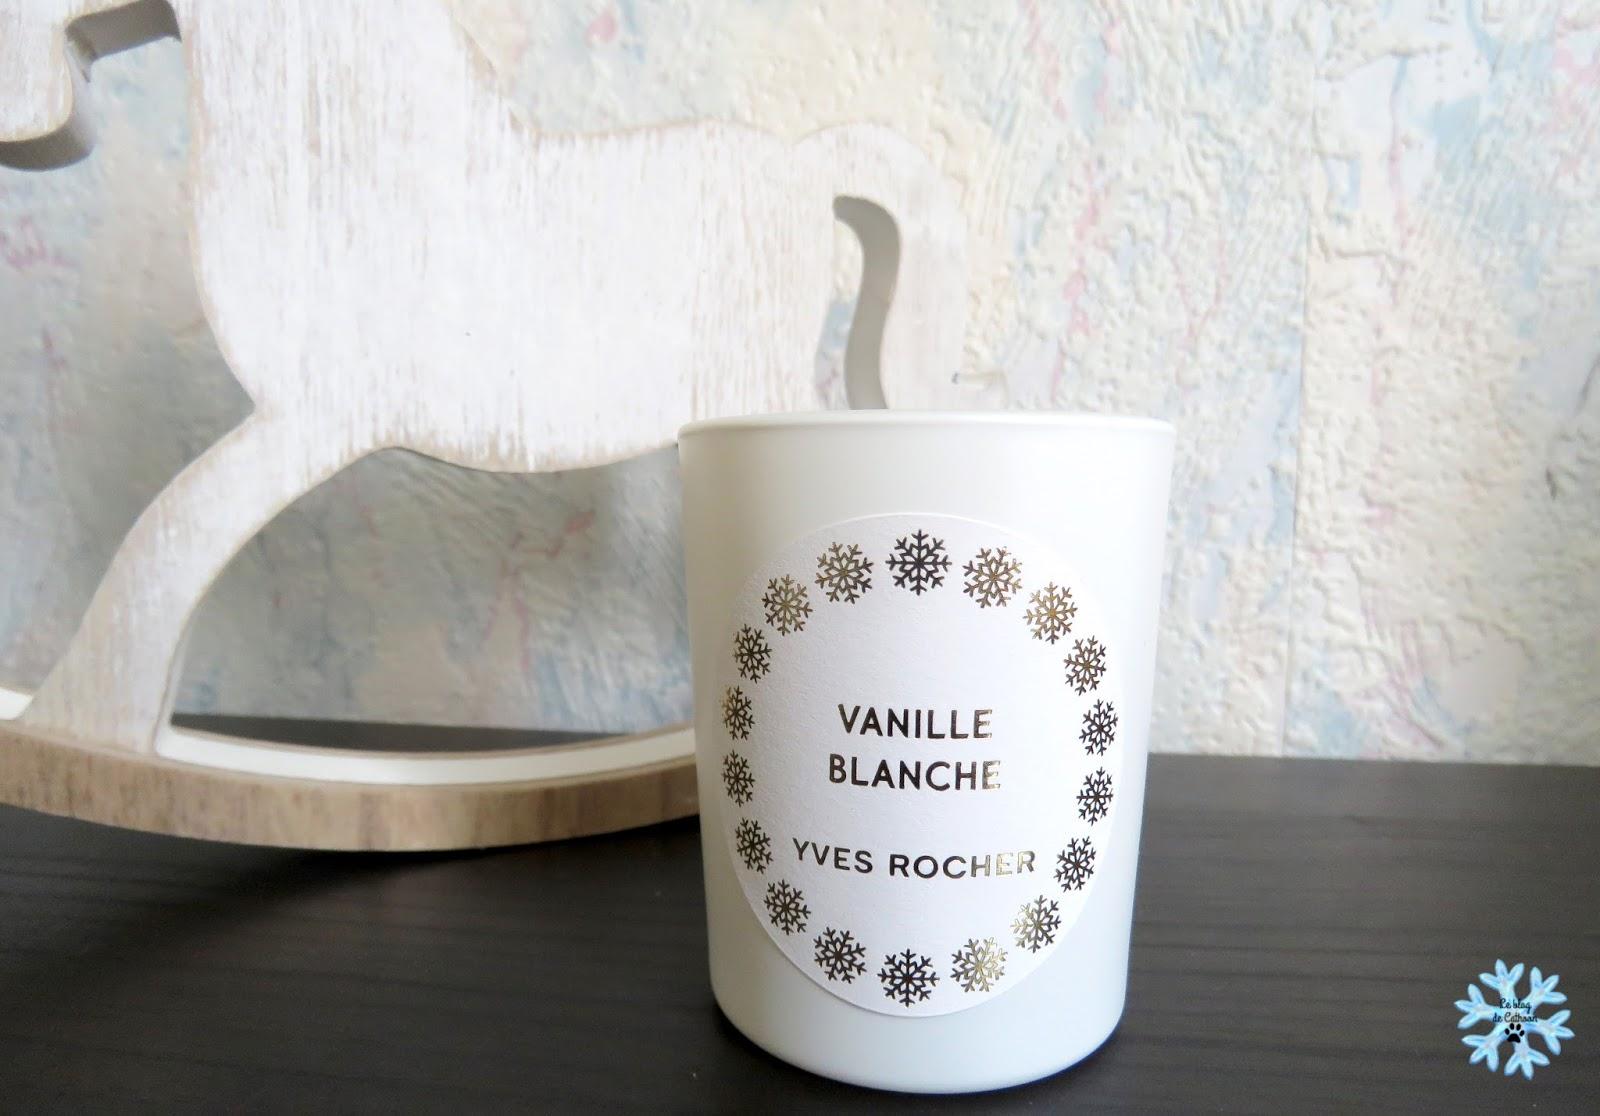 Vanille Blanche - Bougie - Yves Rocher